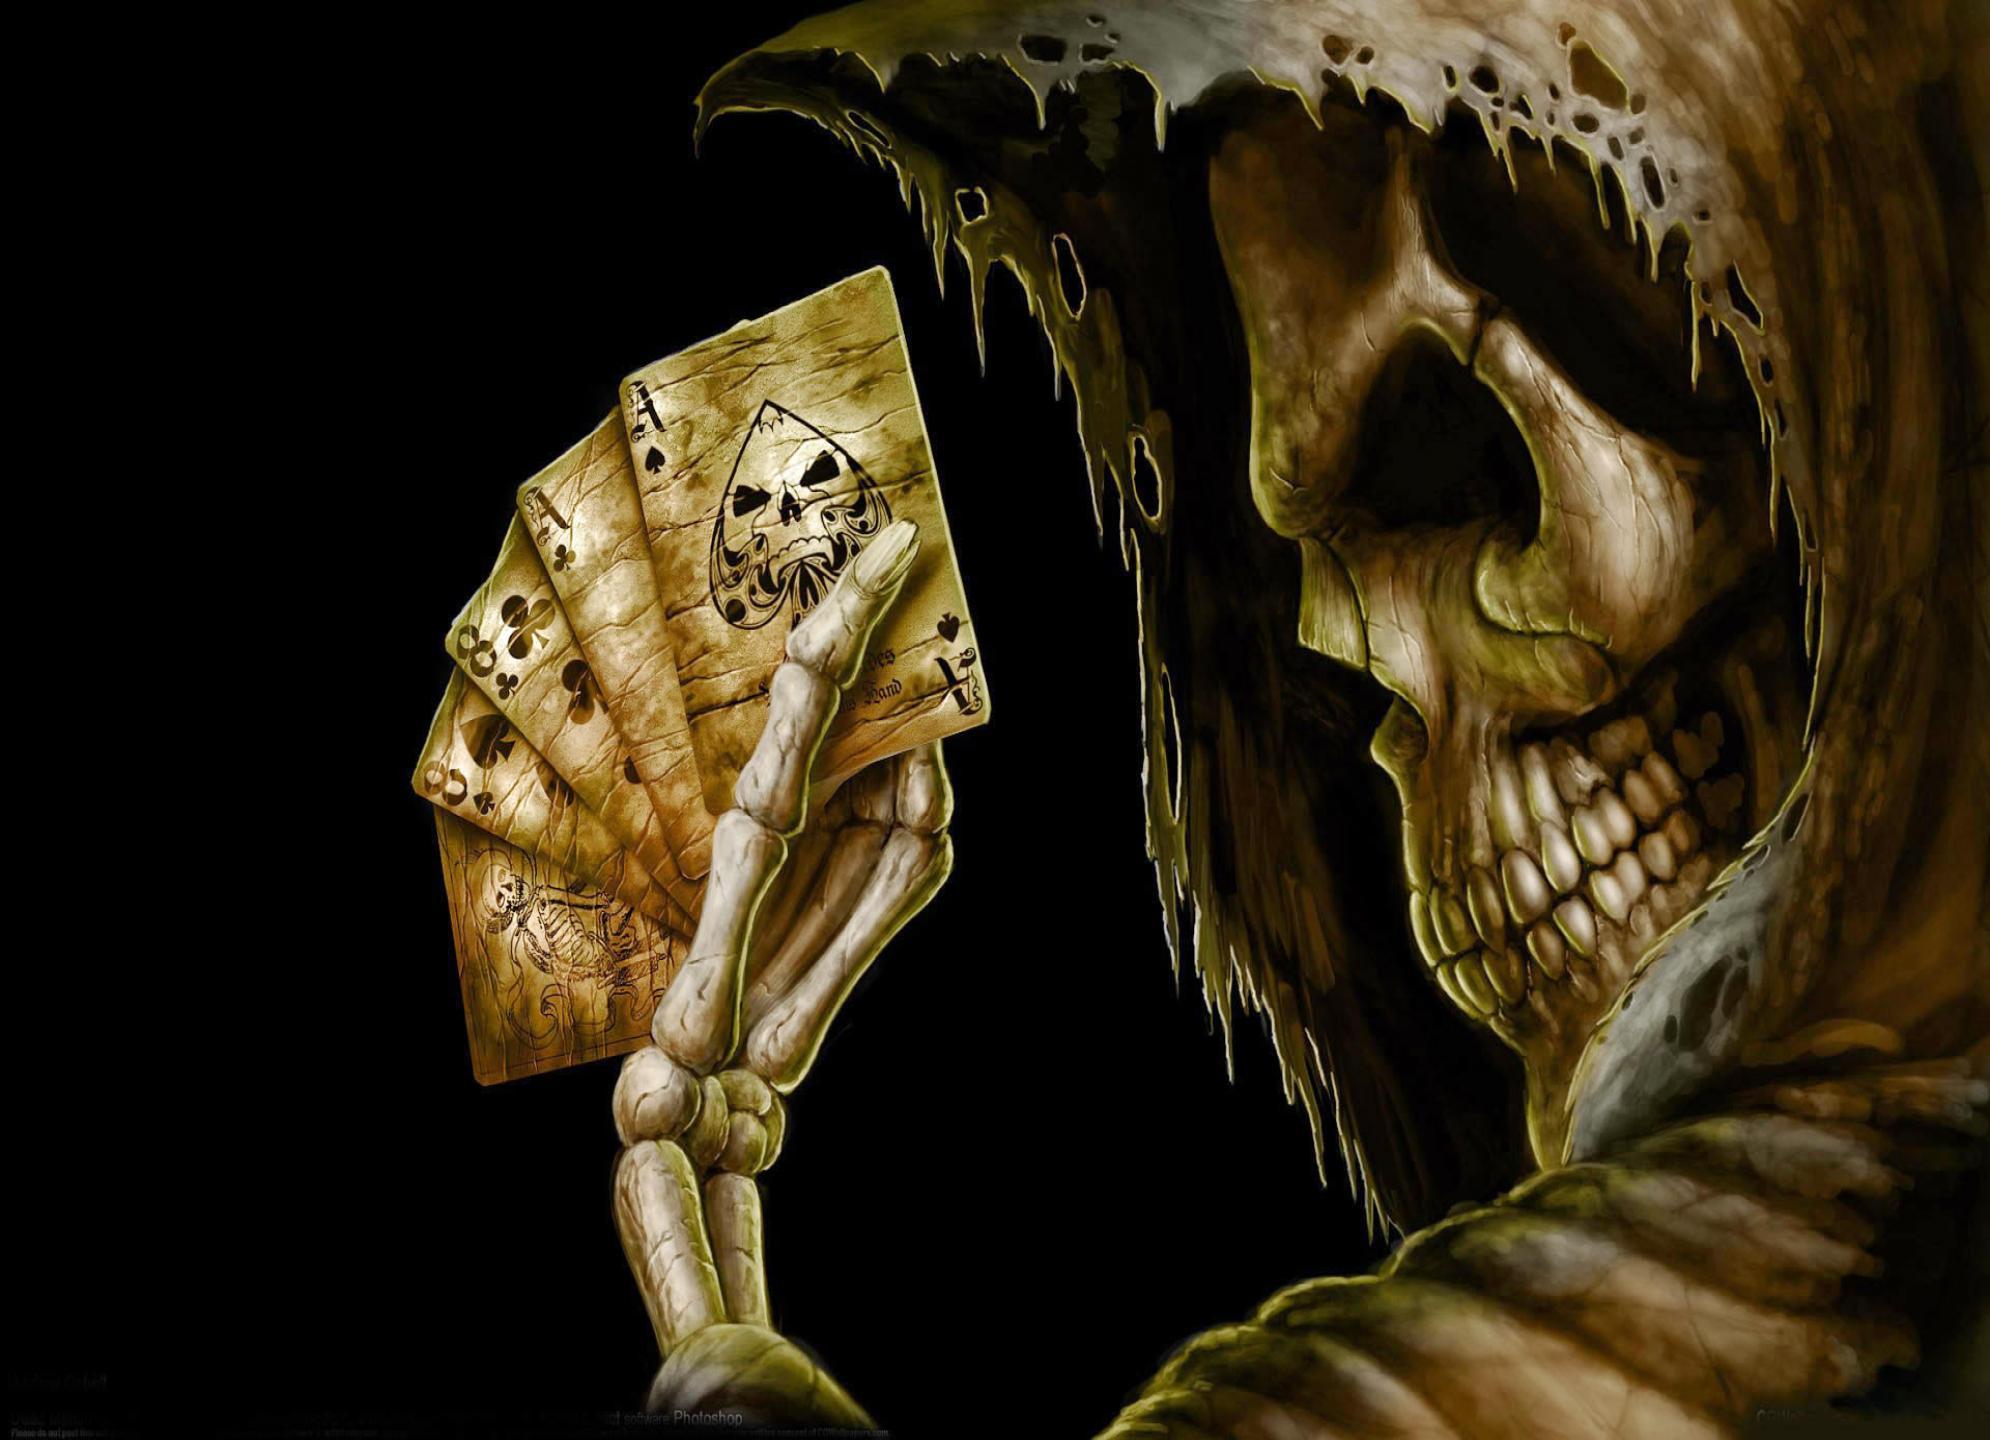 Scary skull wallpaper wallpapersafari - Scary skull backgrounds ...